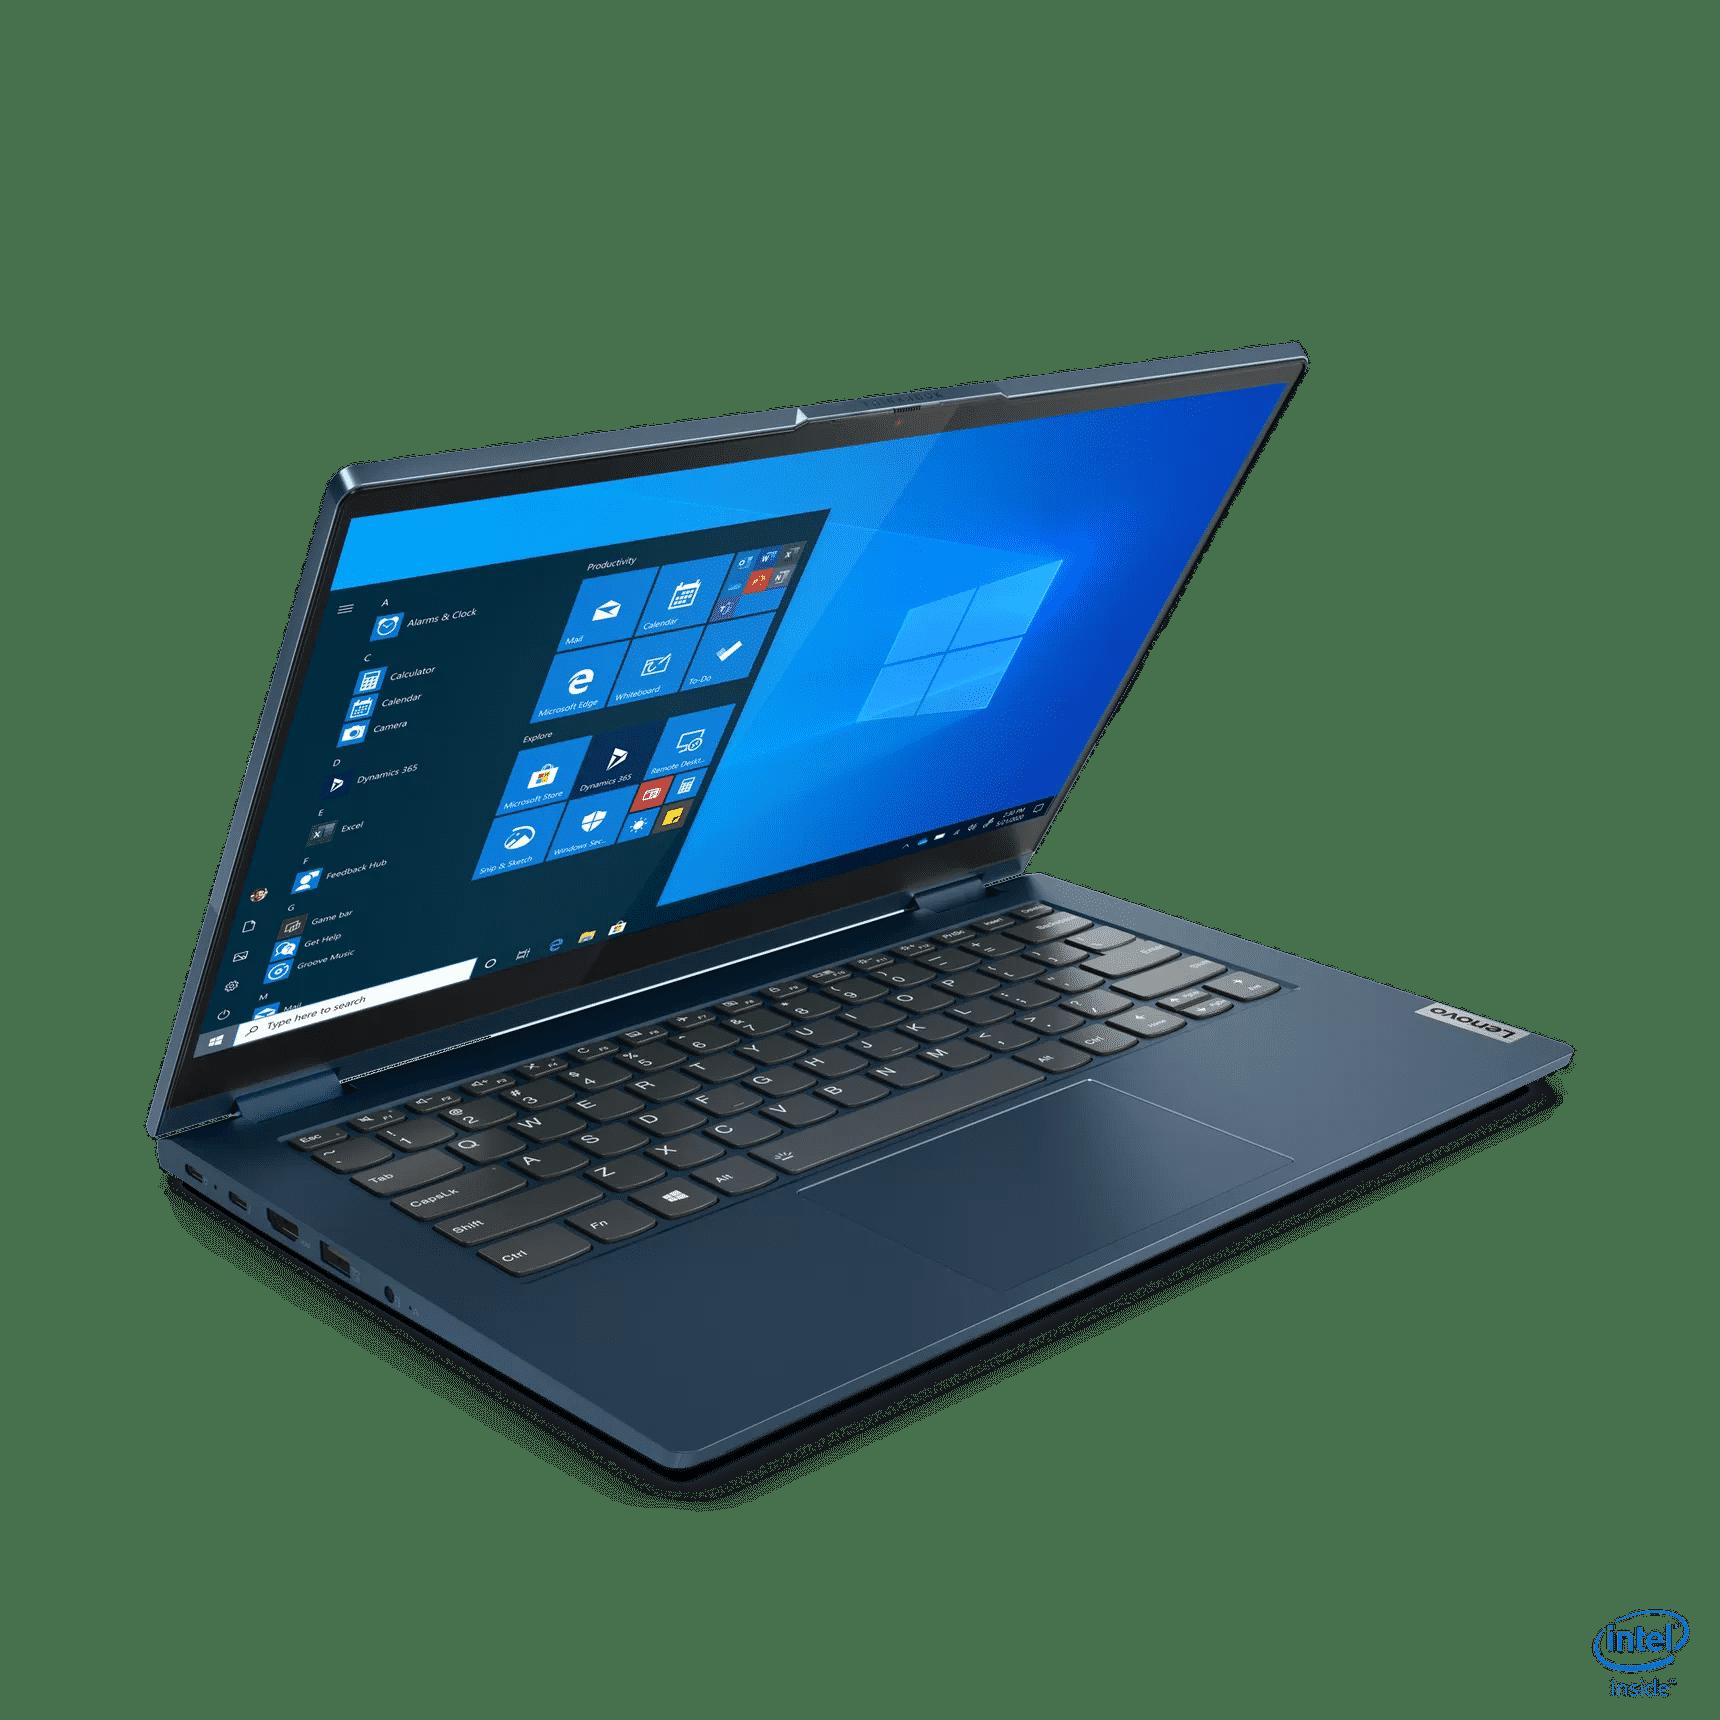 Lenovo ThinkPad 14s Yoga